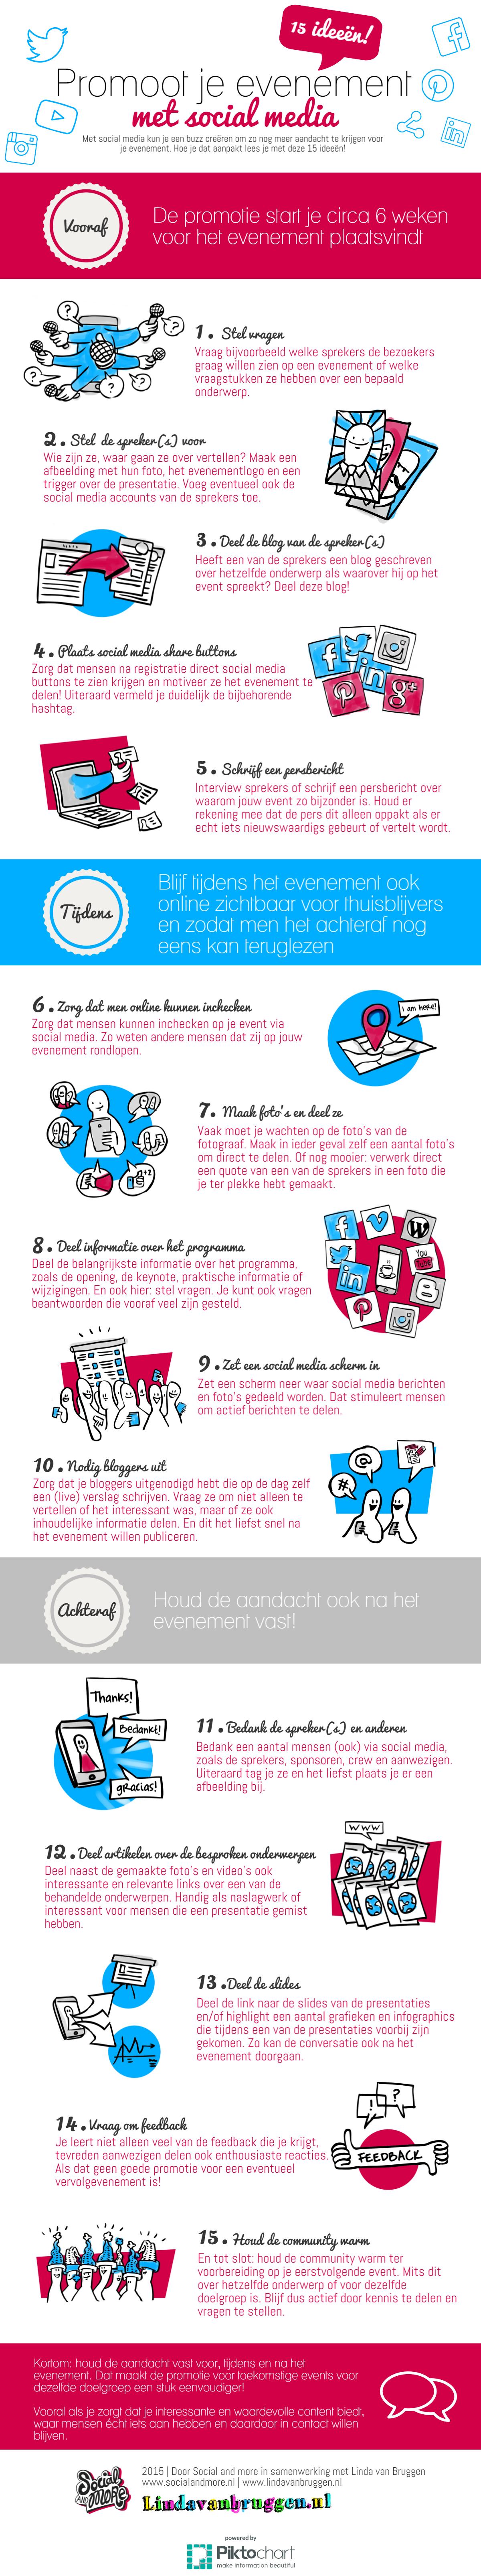 Infographic - social media bij je evenement